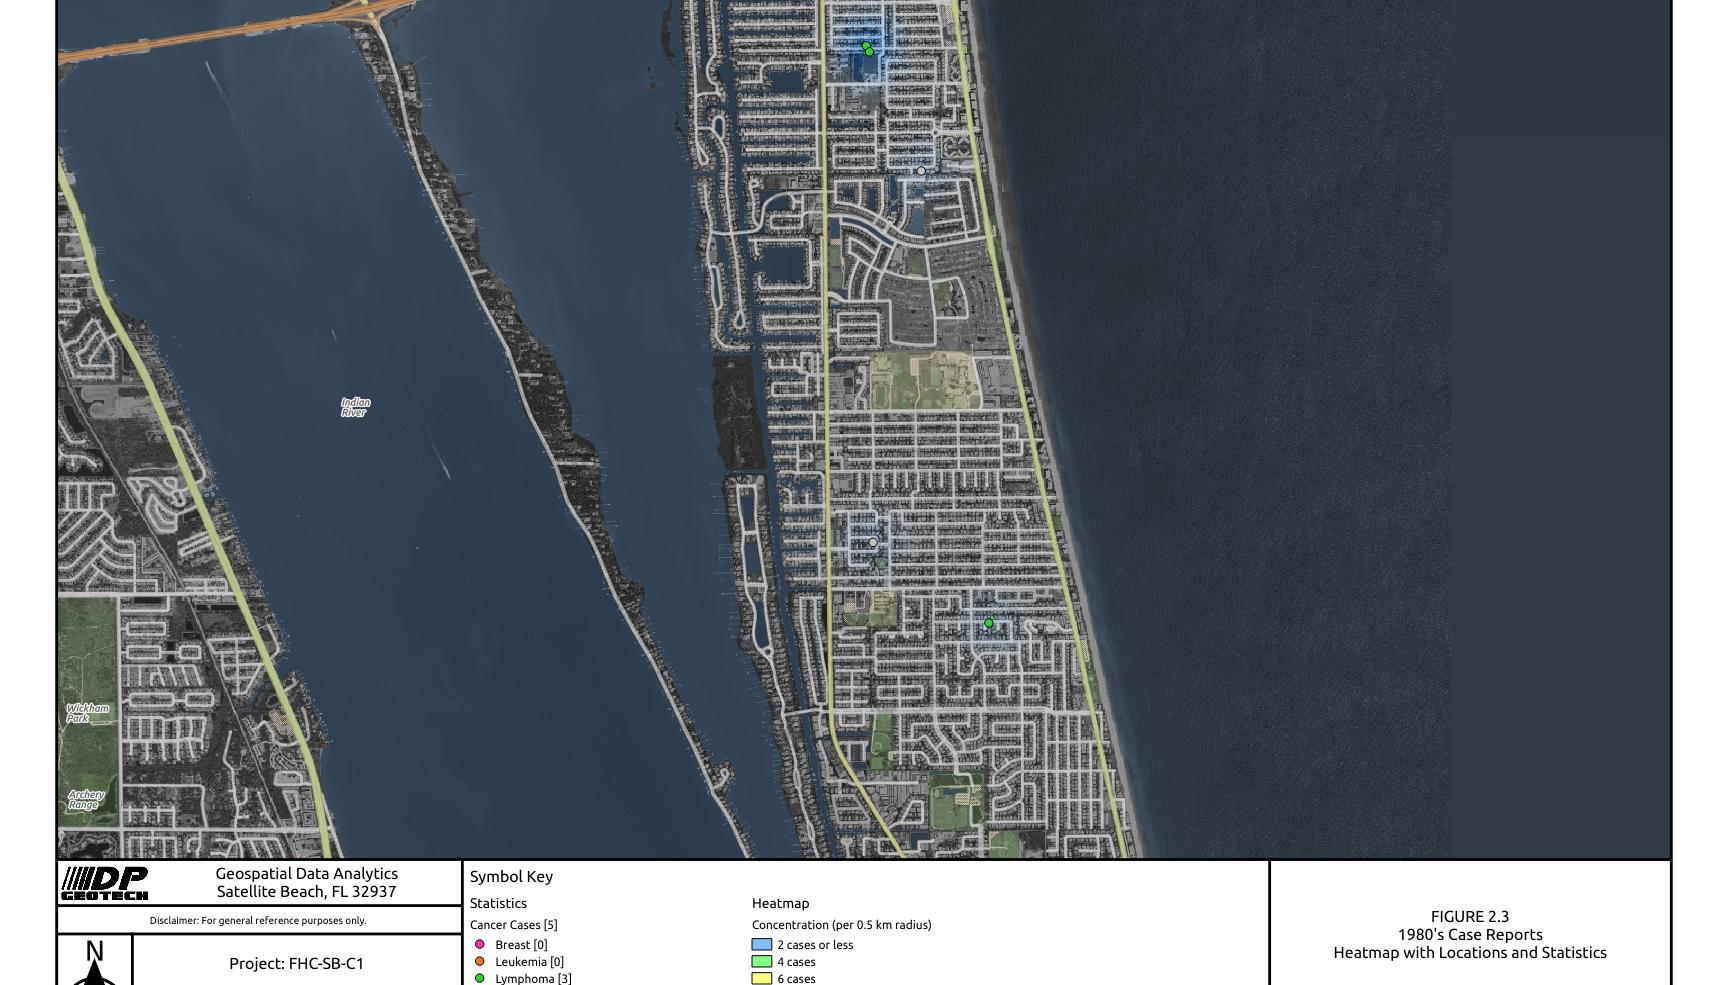 1980 Satellite Beach Cancer Cases Heat Map